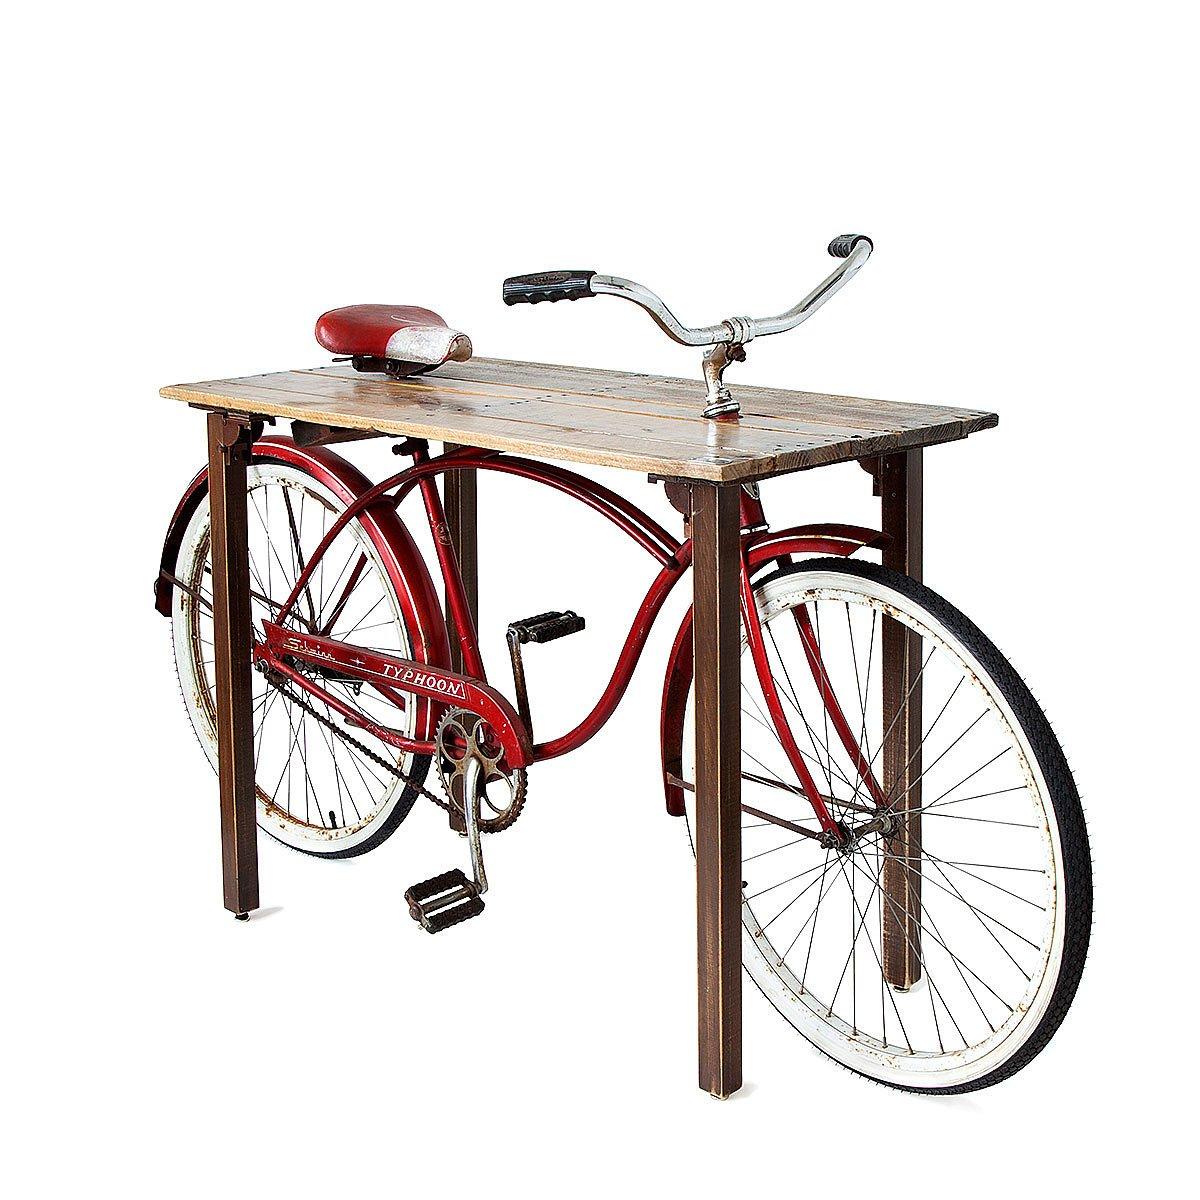 Bicycle Furniture Bike Table Bicycle Home Daccor Hardware Reused In Furniture